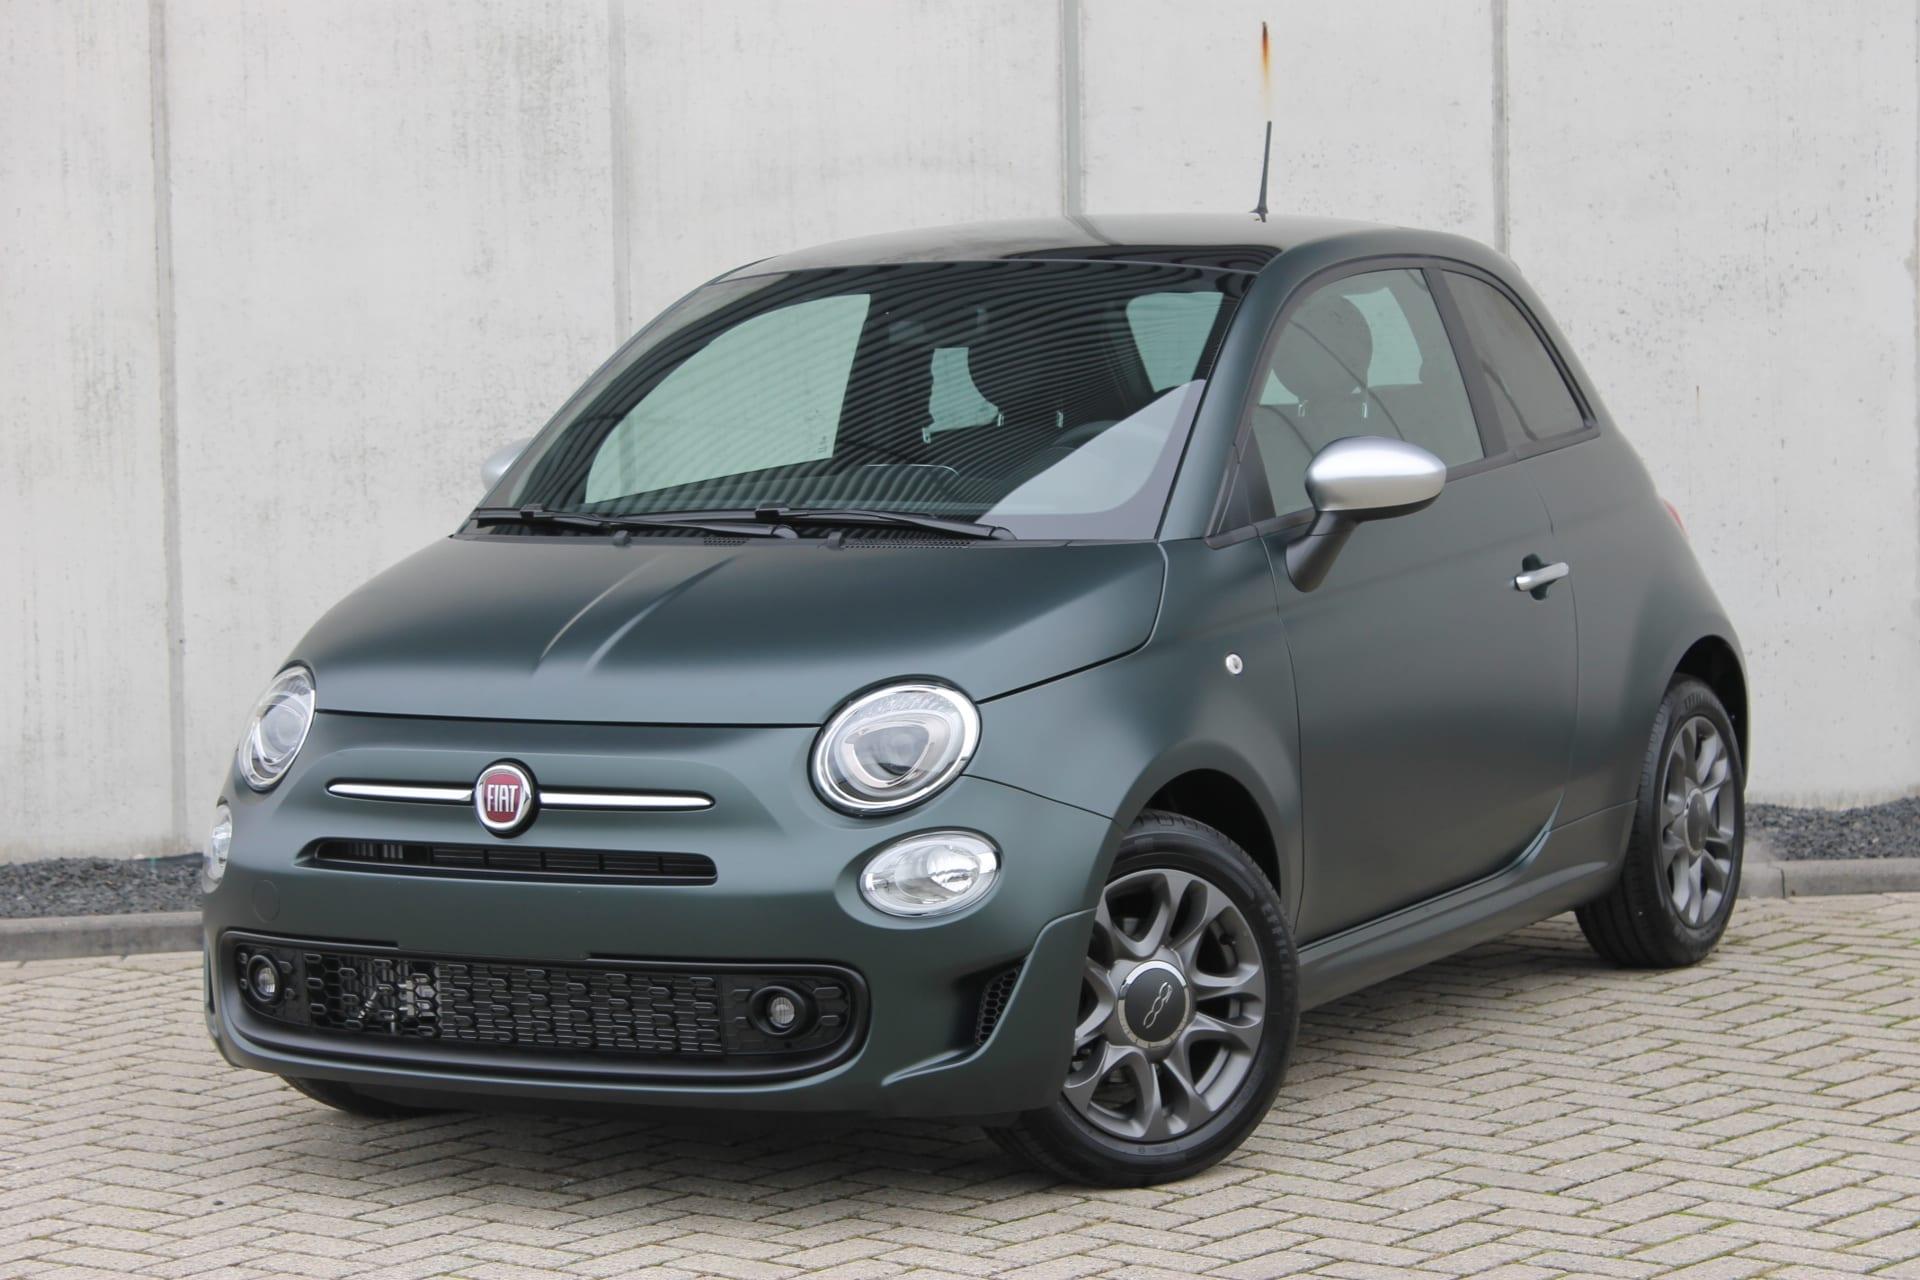 Fiat 500 Rockstar matgroen - voorkant